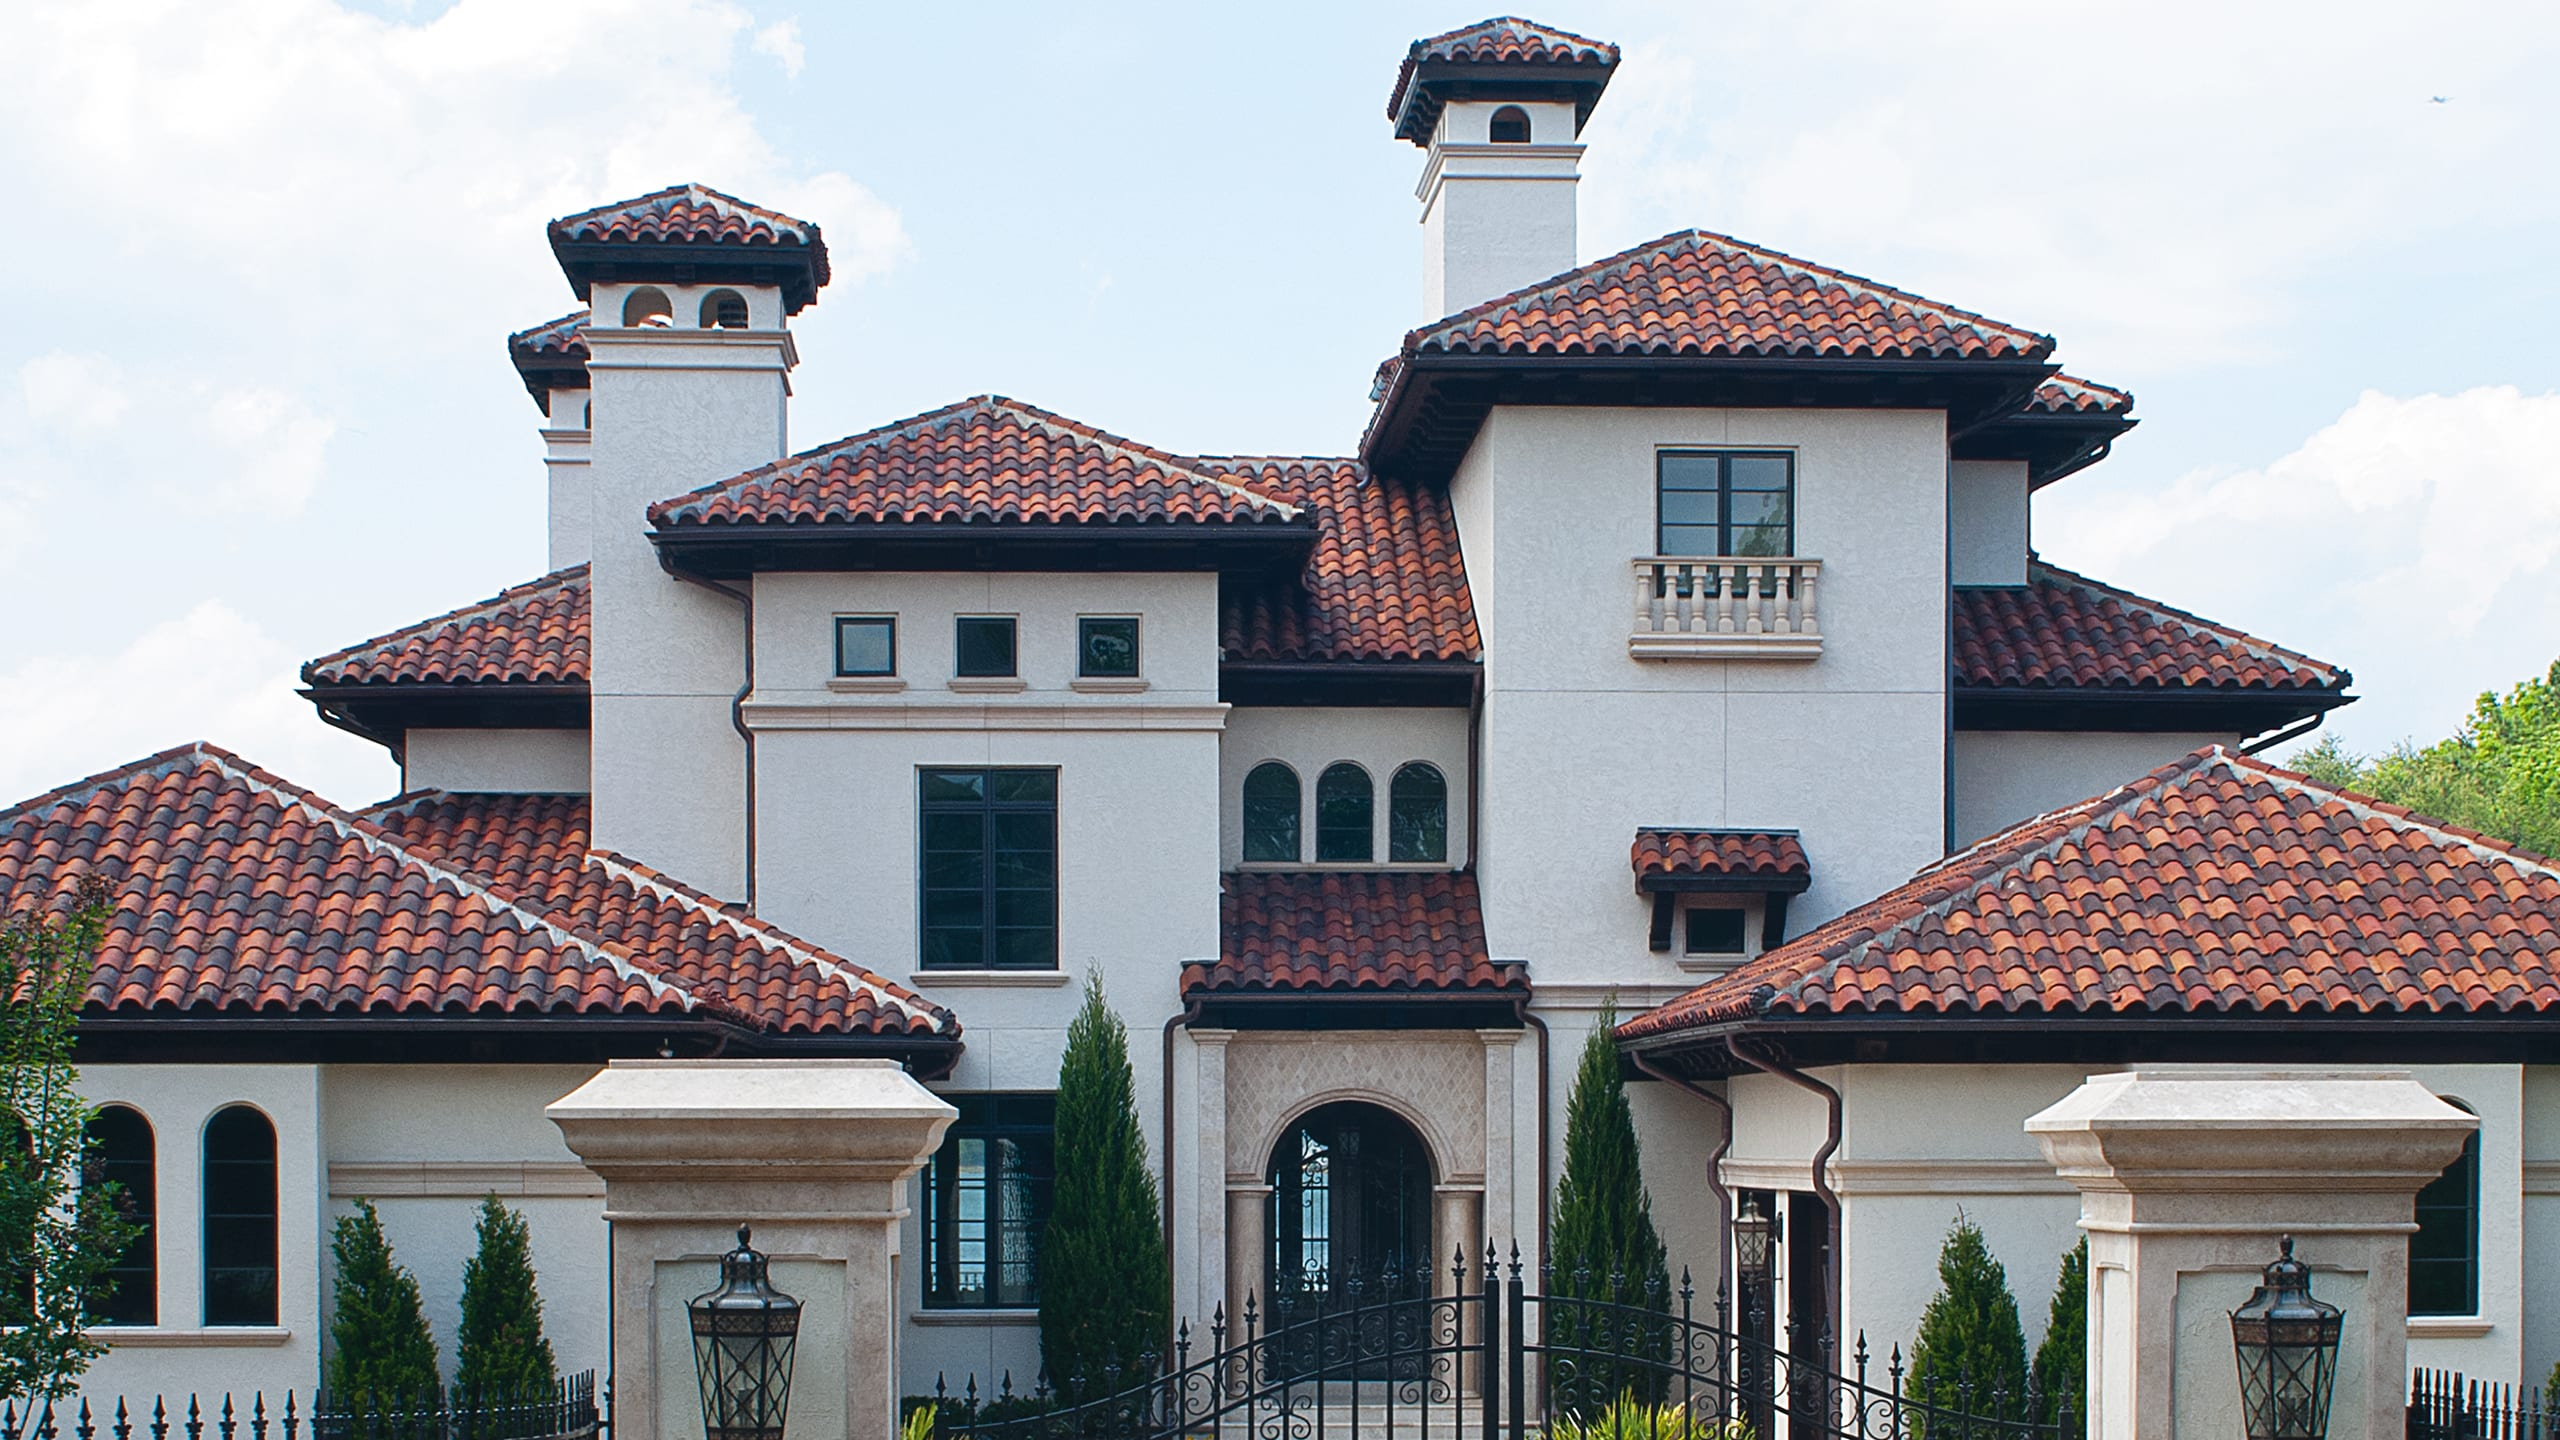 Private Residence - Cornelius Ludowici Roof Tile